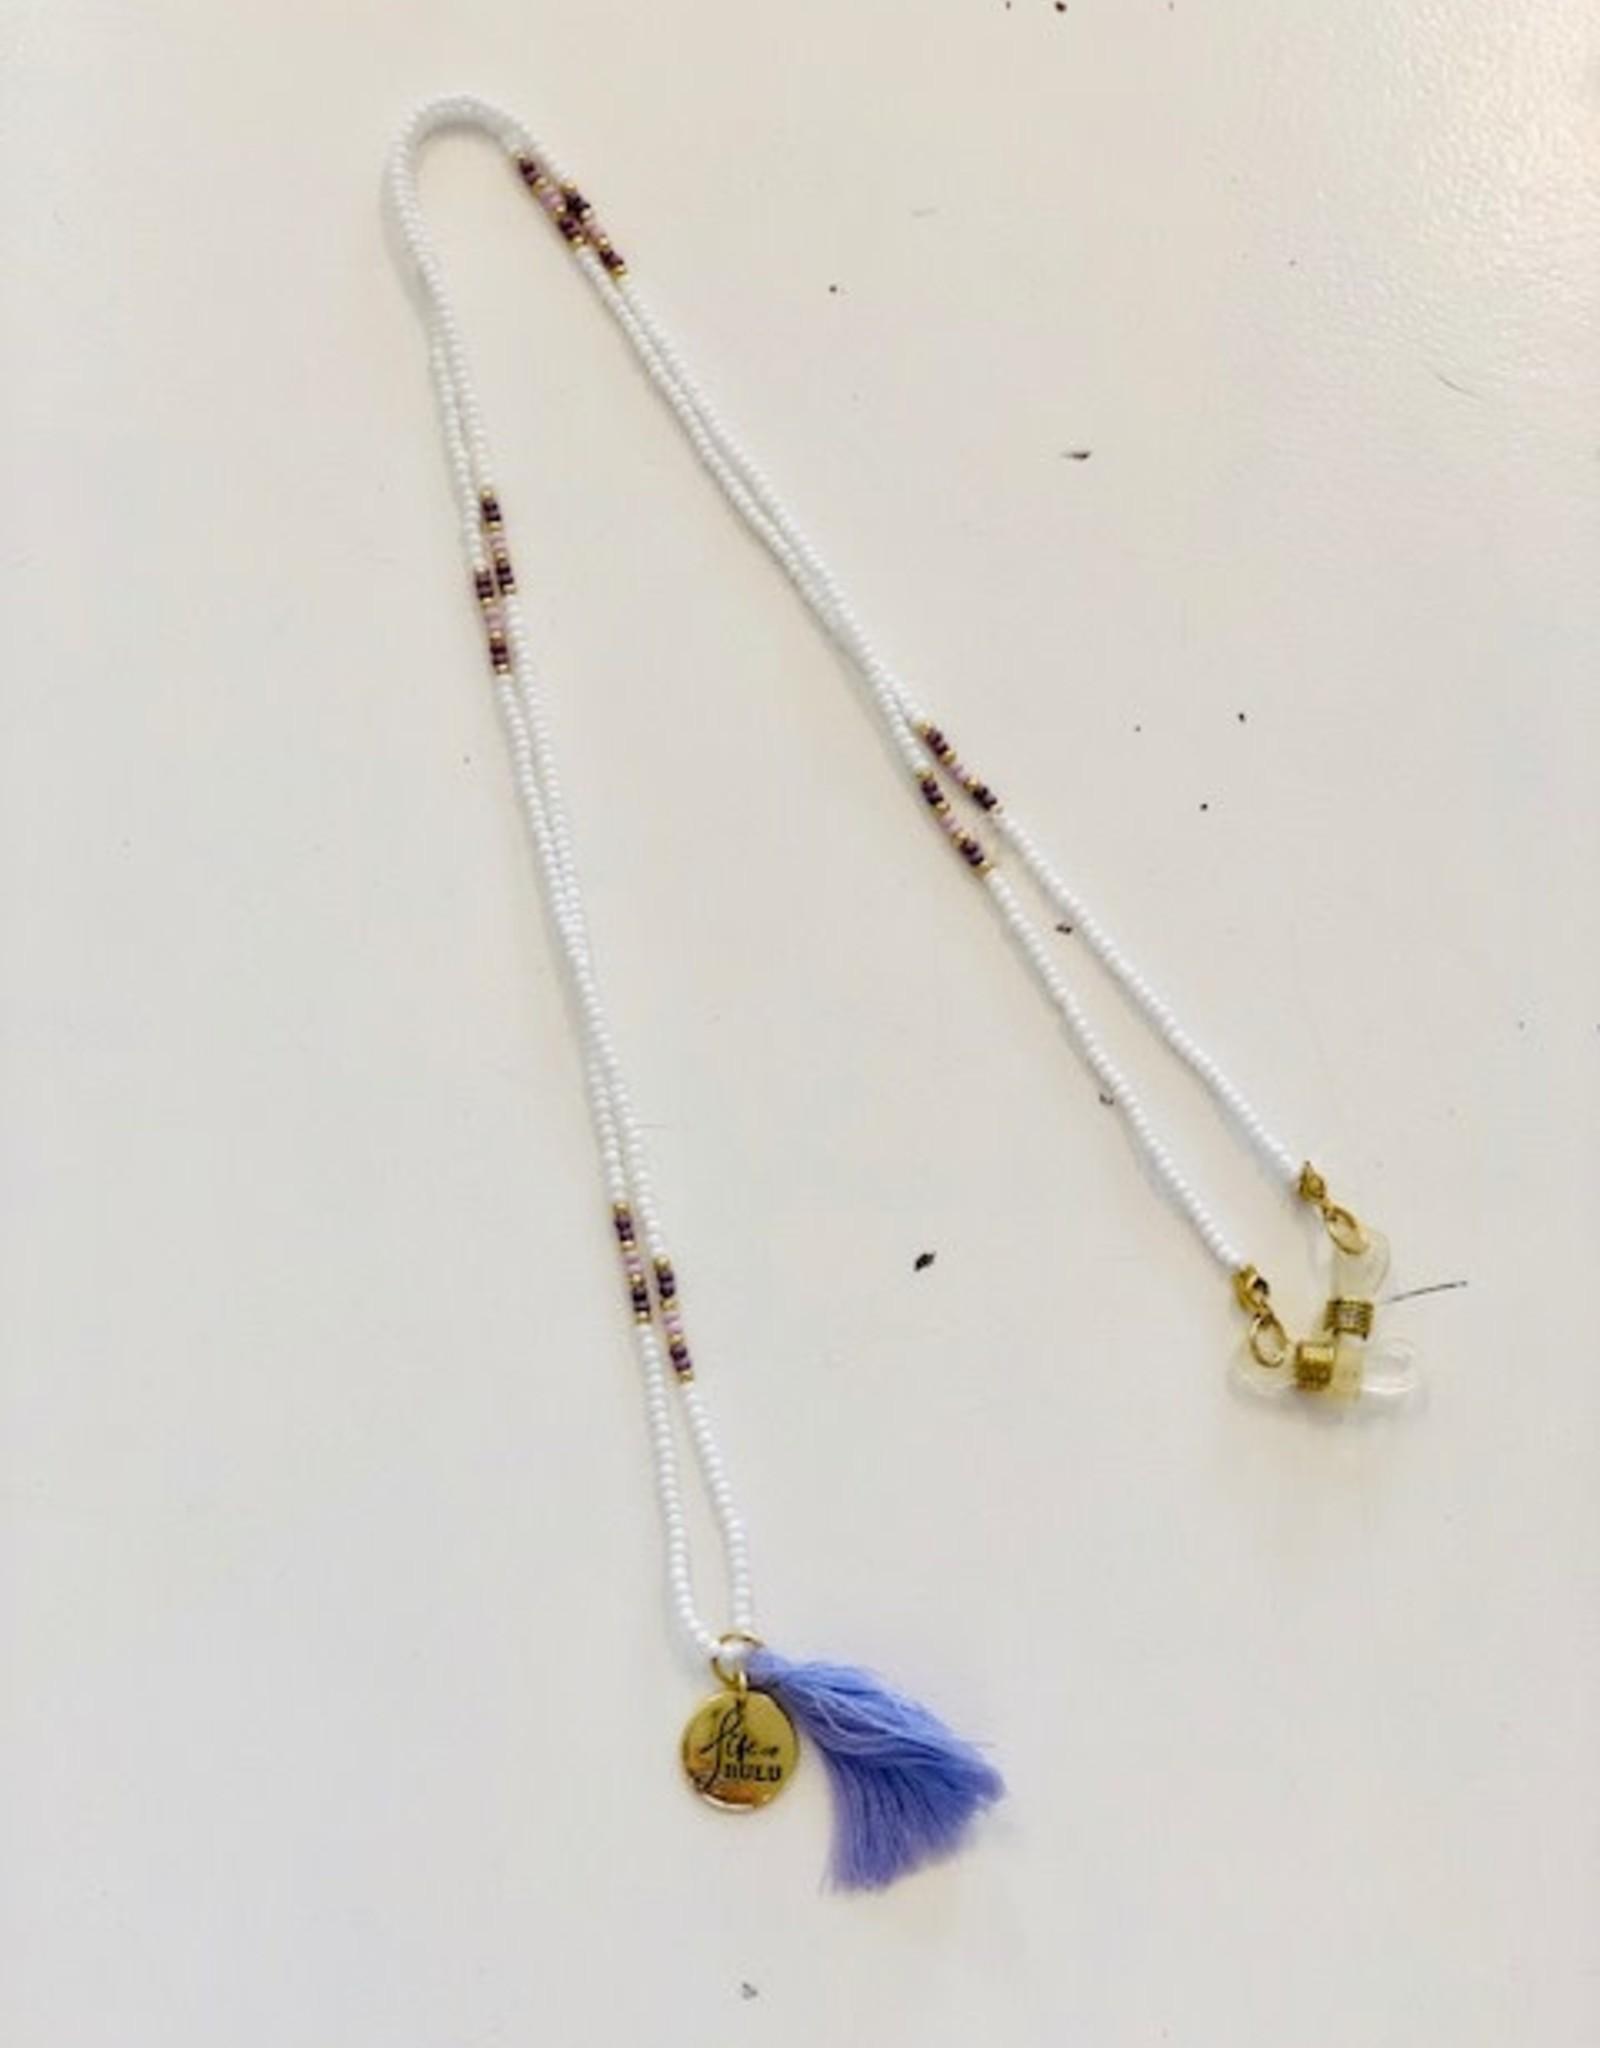 Bulu Bulu Happy Beads Suncords wit/paars